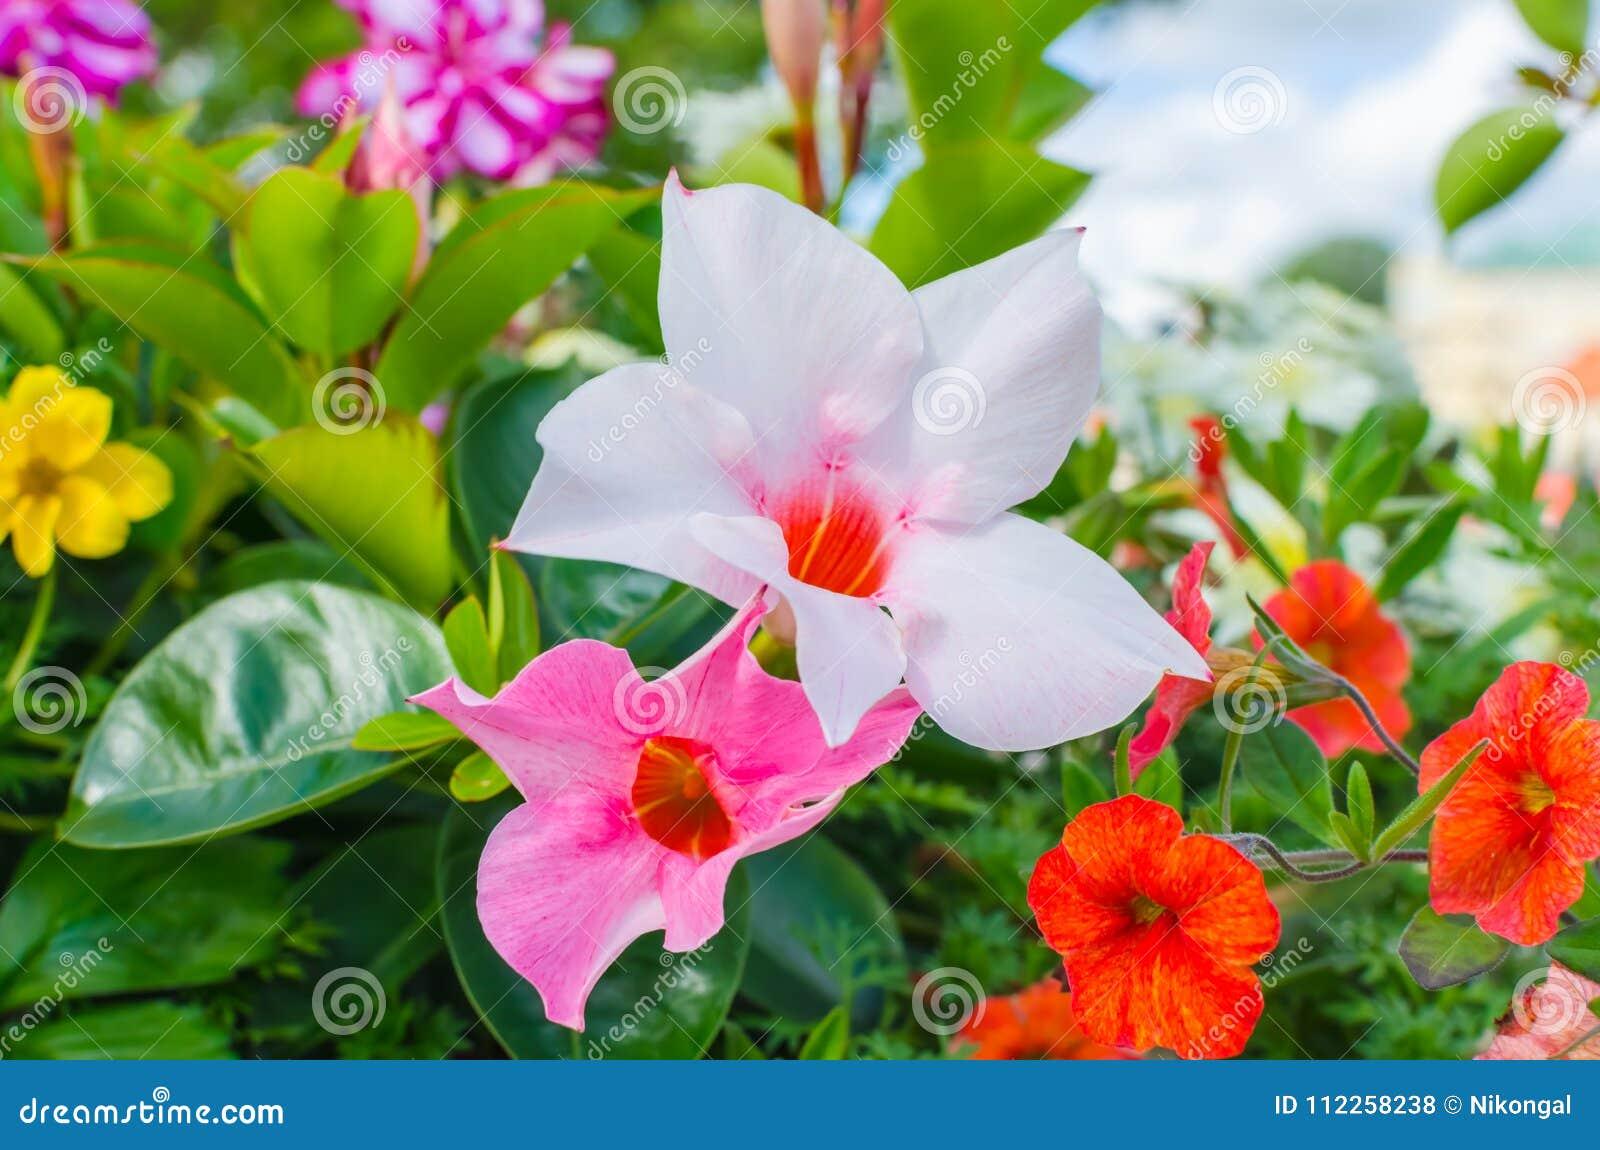 Various colourful flowers blooming in spring stock photo image of various colourful flowers blooming in spring mightylinksfo